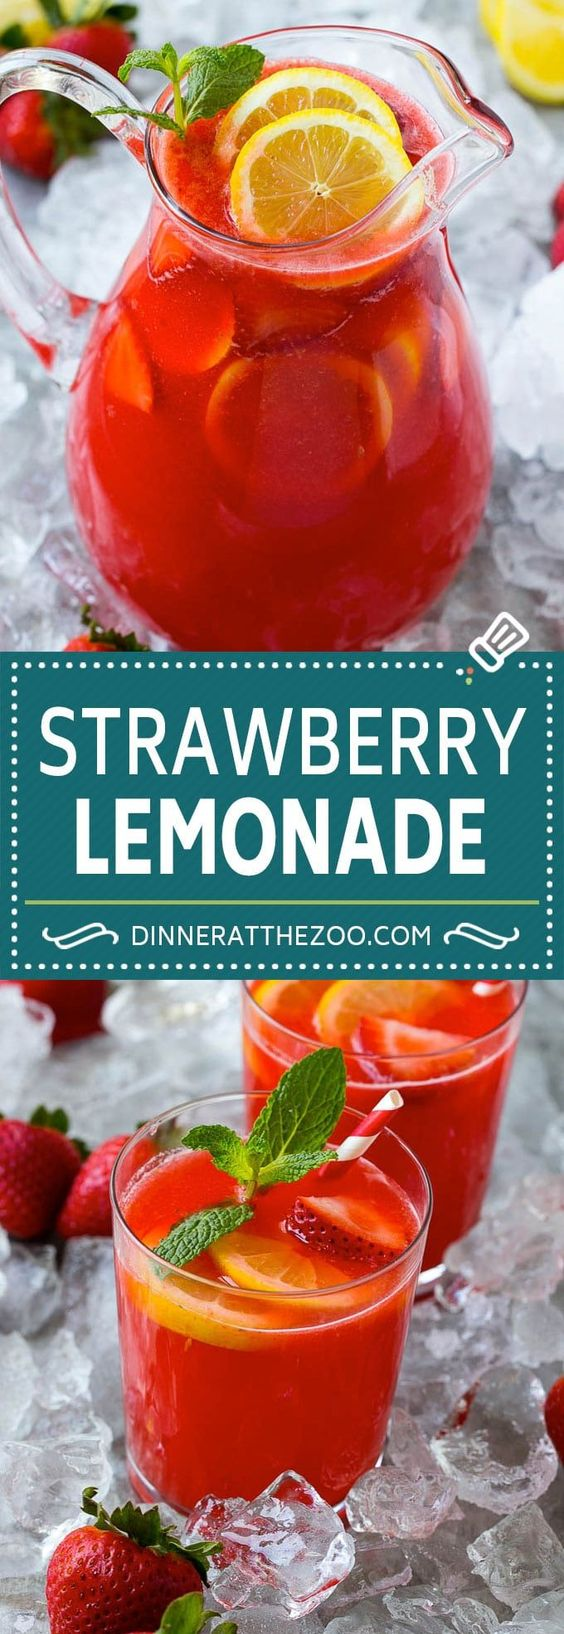 Strawberry Lemonade Recipe | Homemade Lemonade | Strawberry Drink Recipe #lemonade #strawberries #drink #dinneratthezoo